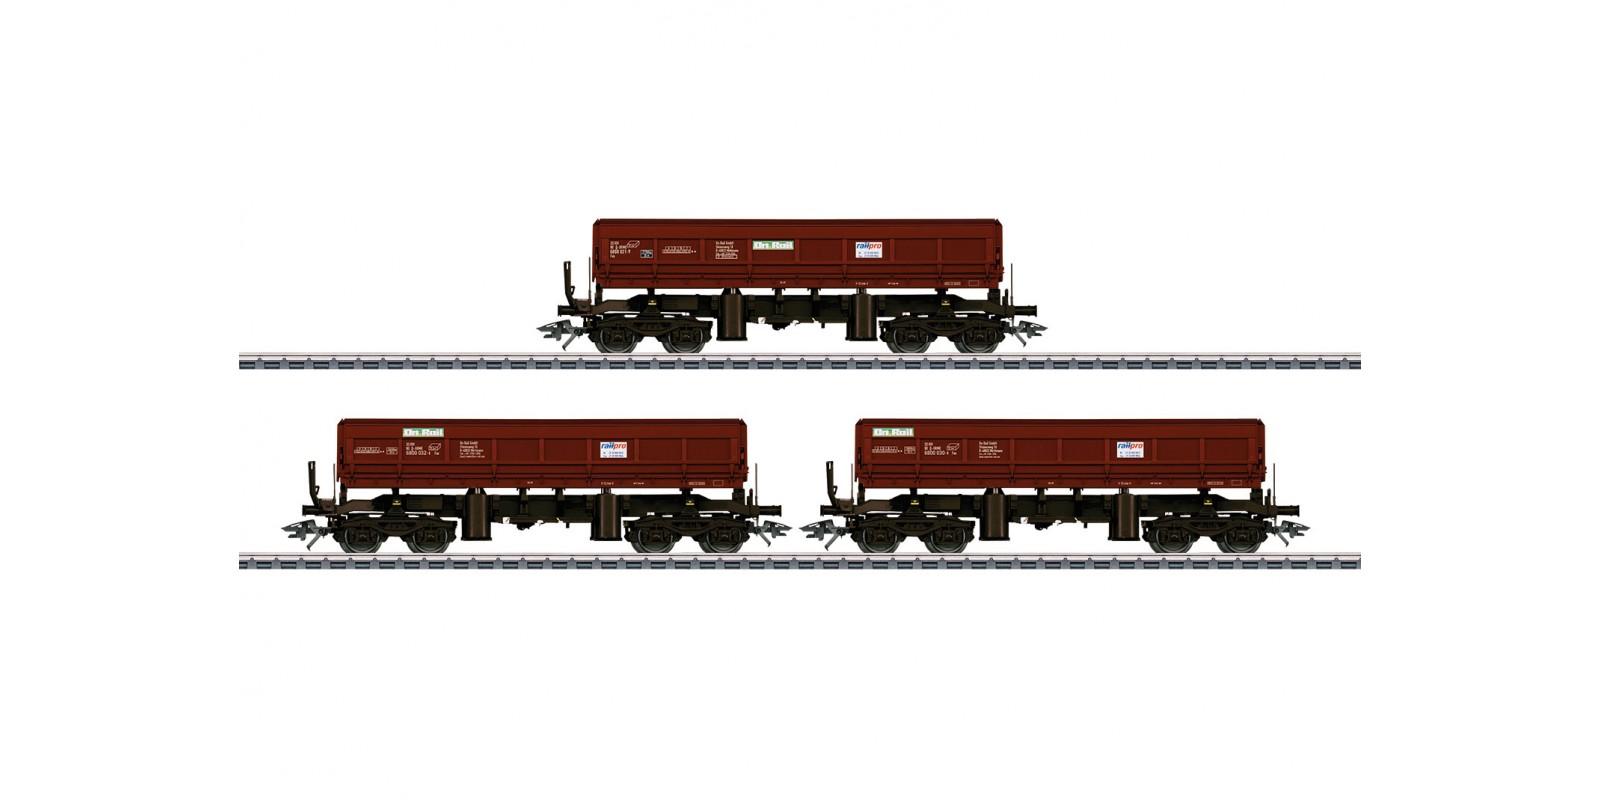 48456 Type Fas 680 Bulk Freight Dump Car Set